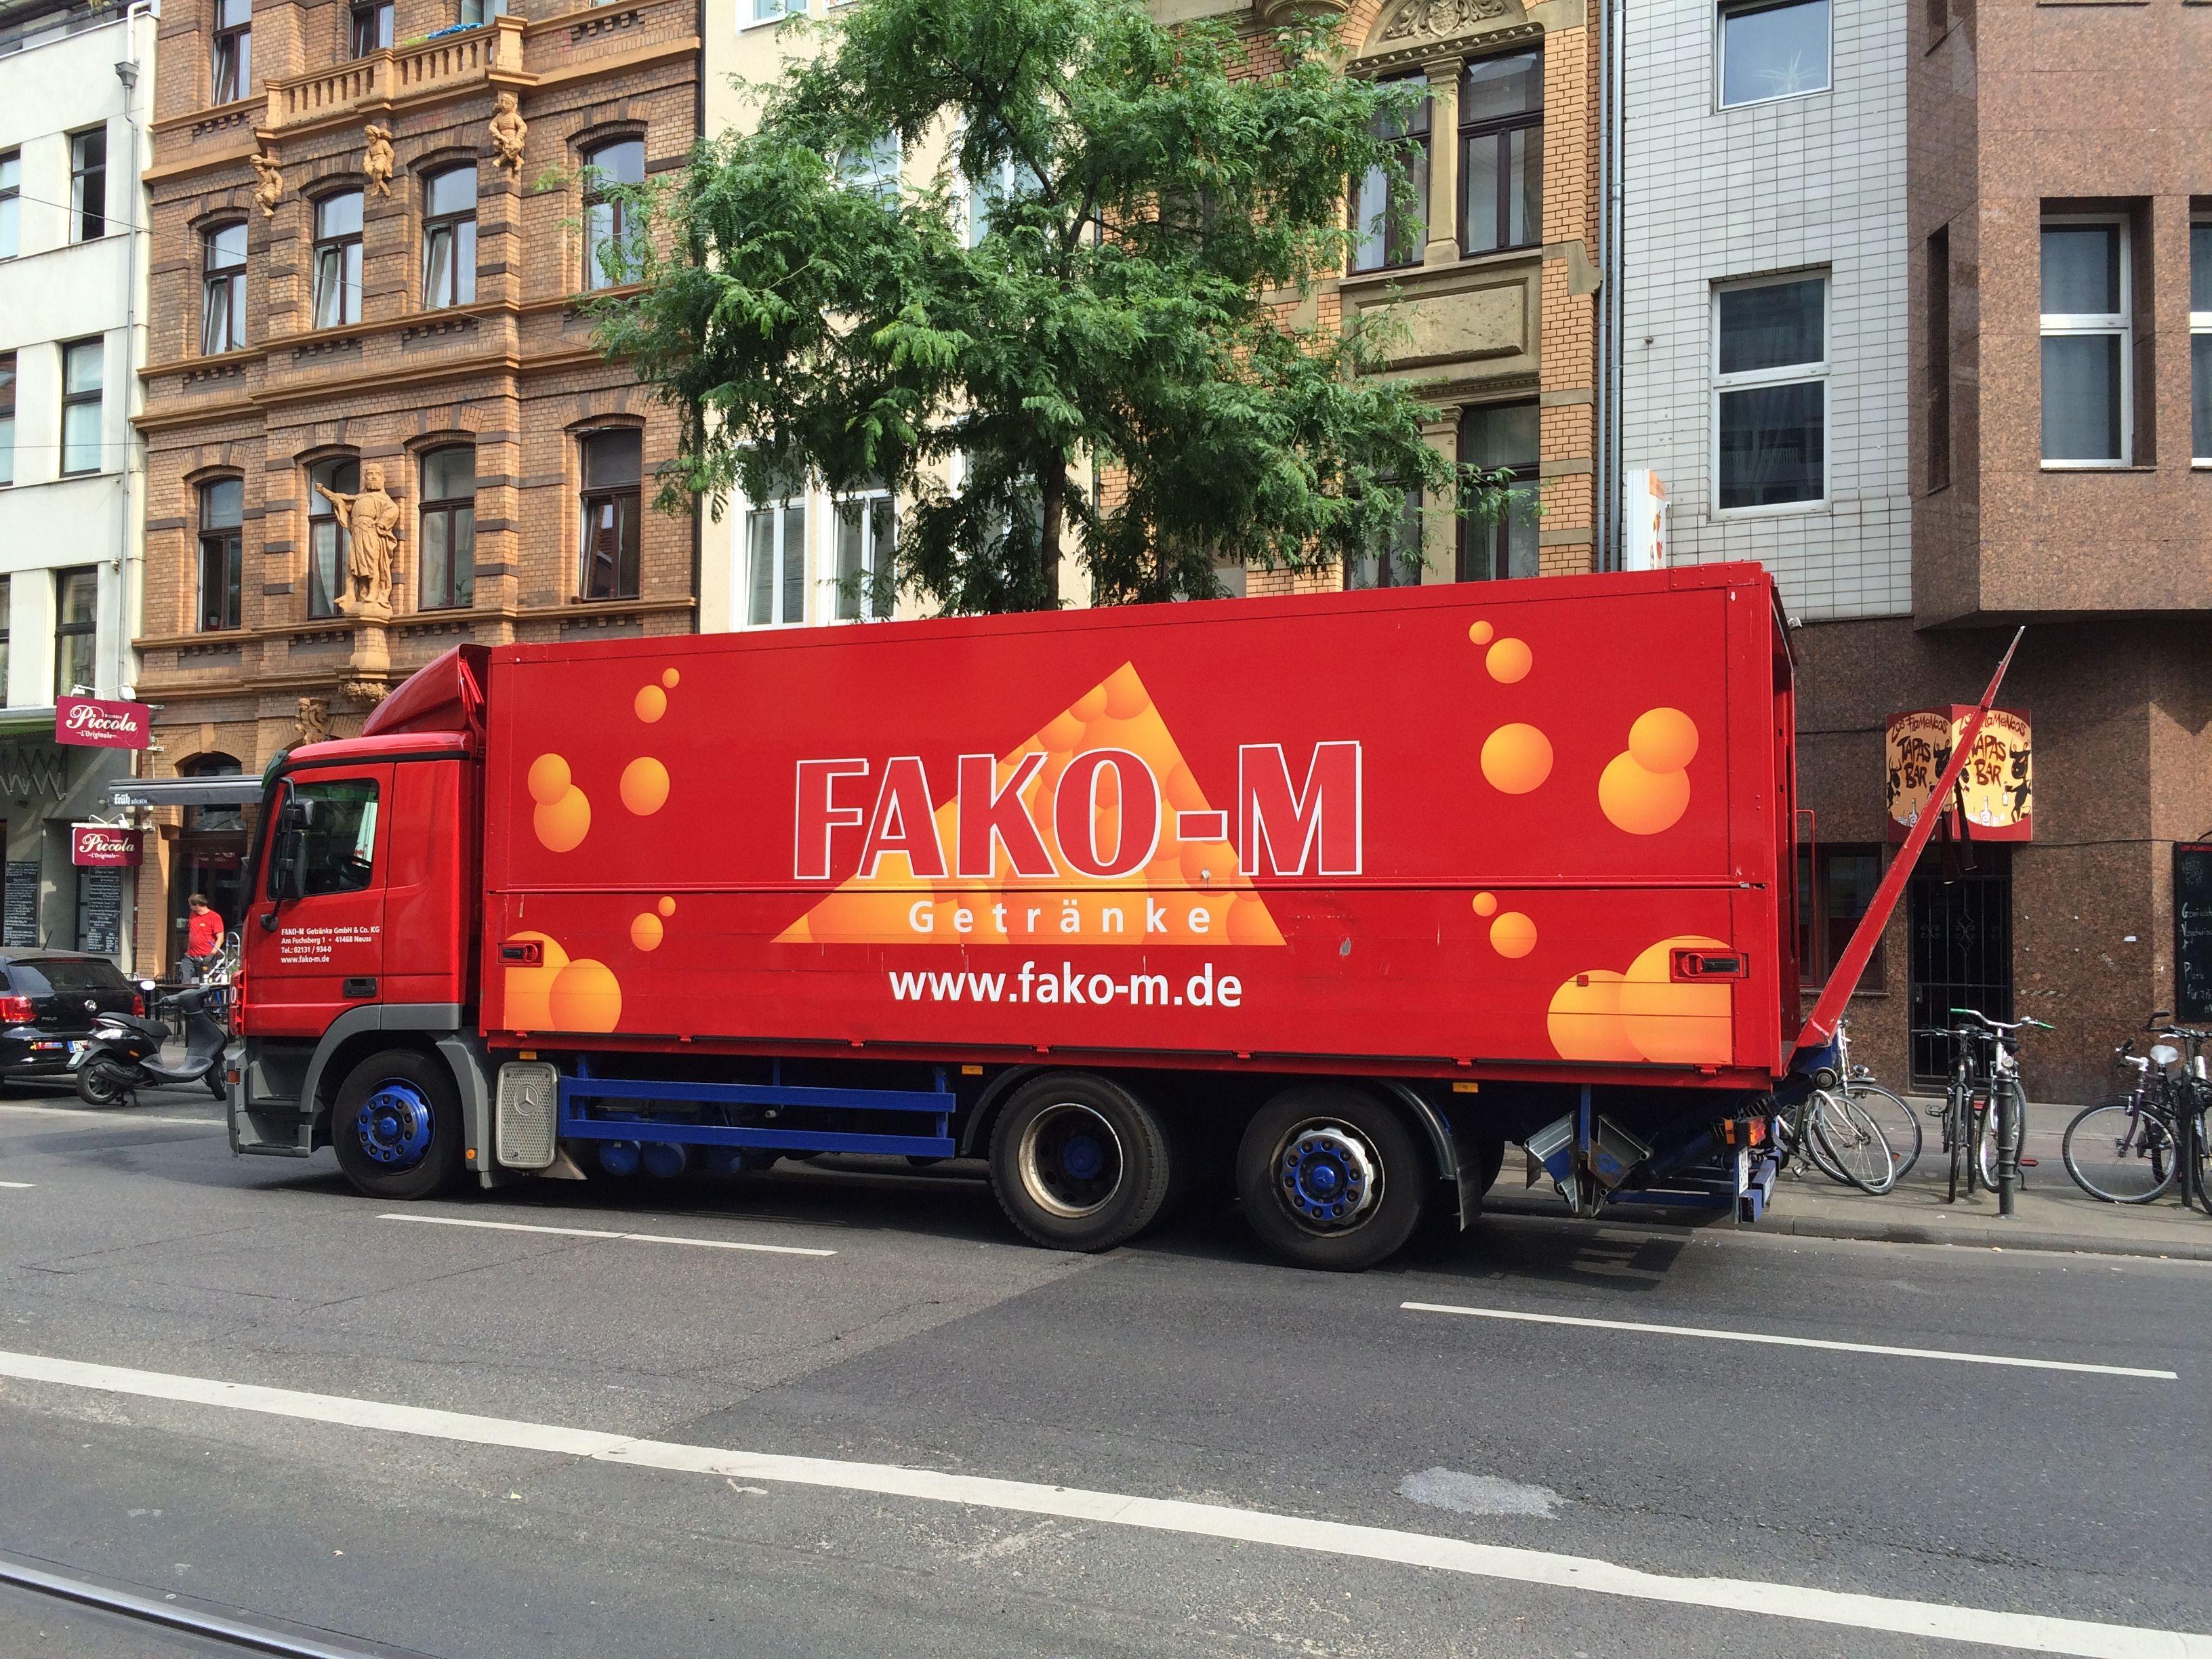 fako-m.de | yummy.domains | Pinterest